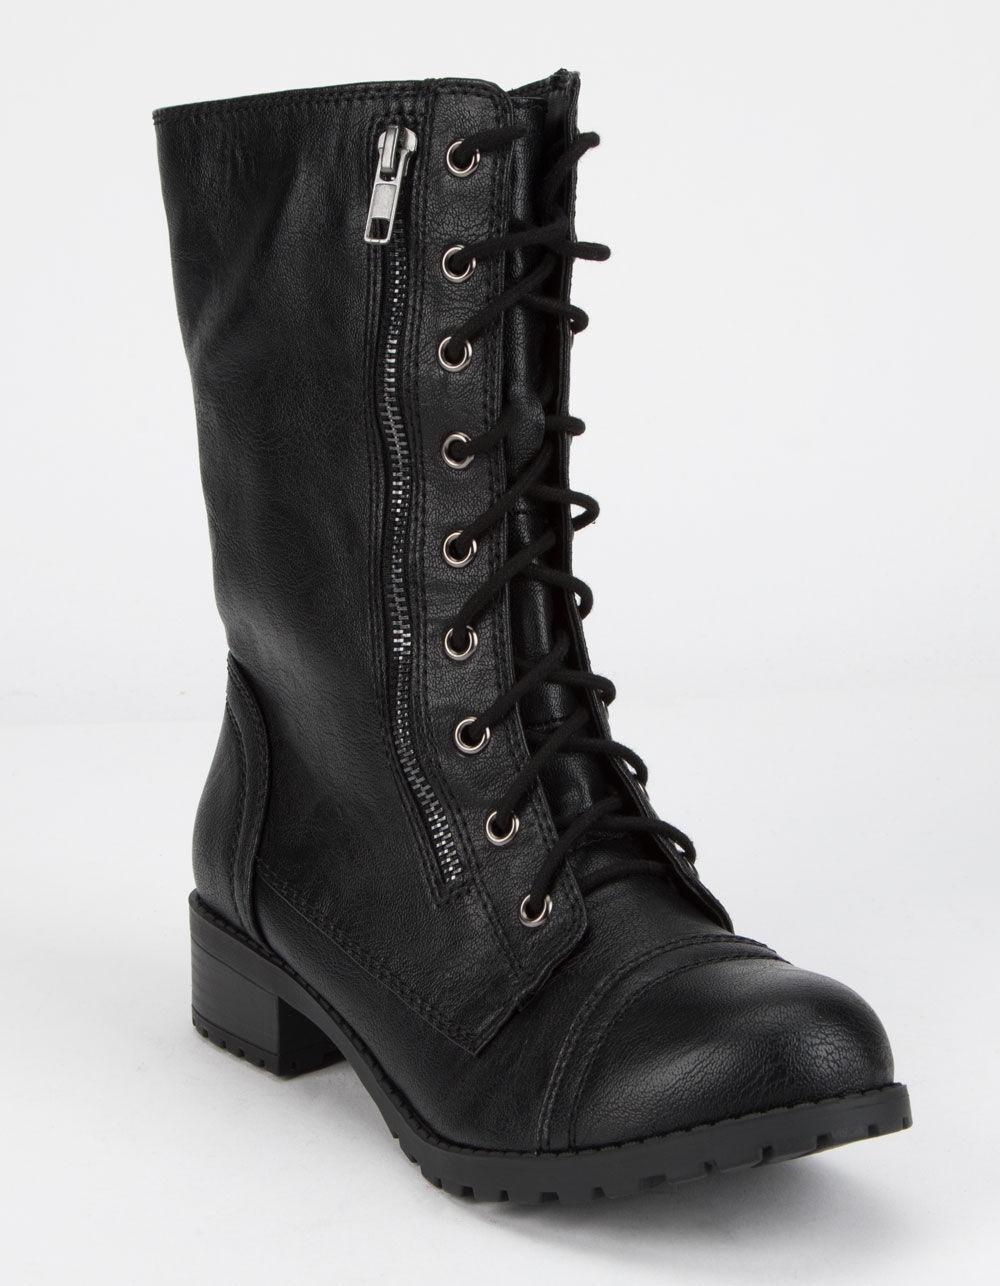 SODA Lace Up Black Combat Boots